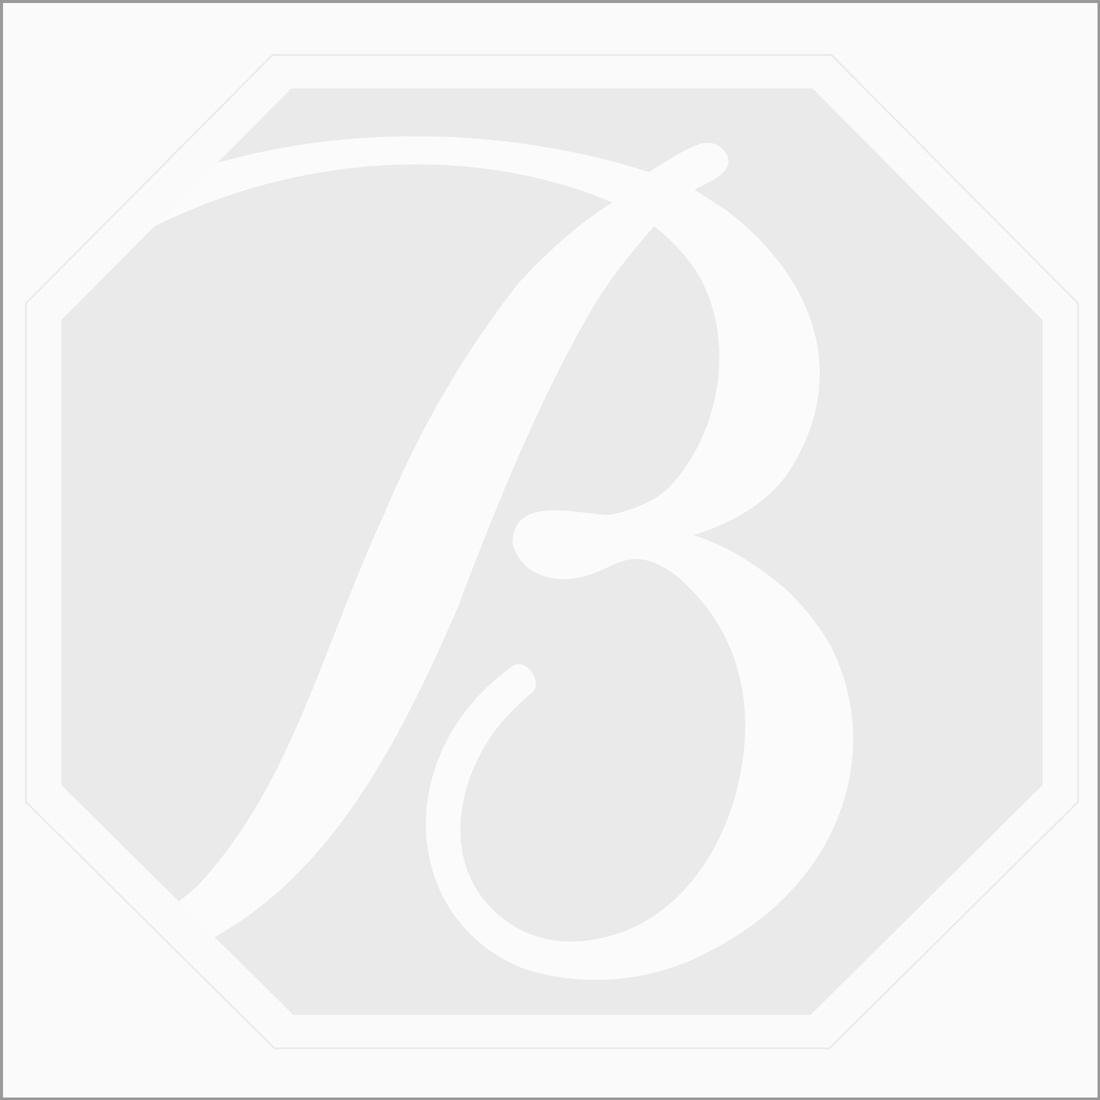 24 x 14 mm - Watermelon (Bi-Color) Tourmaline Carving - 23.00 carats (ToCarv1025)